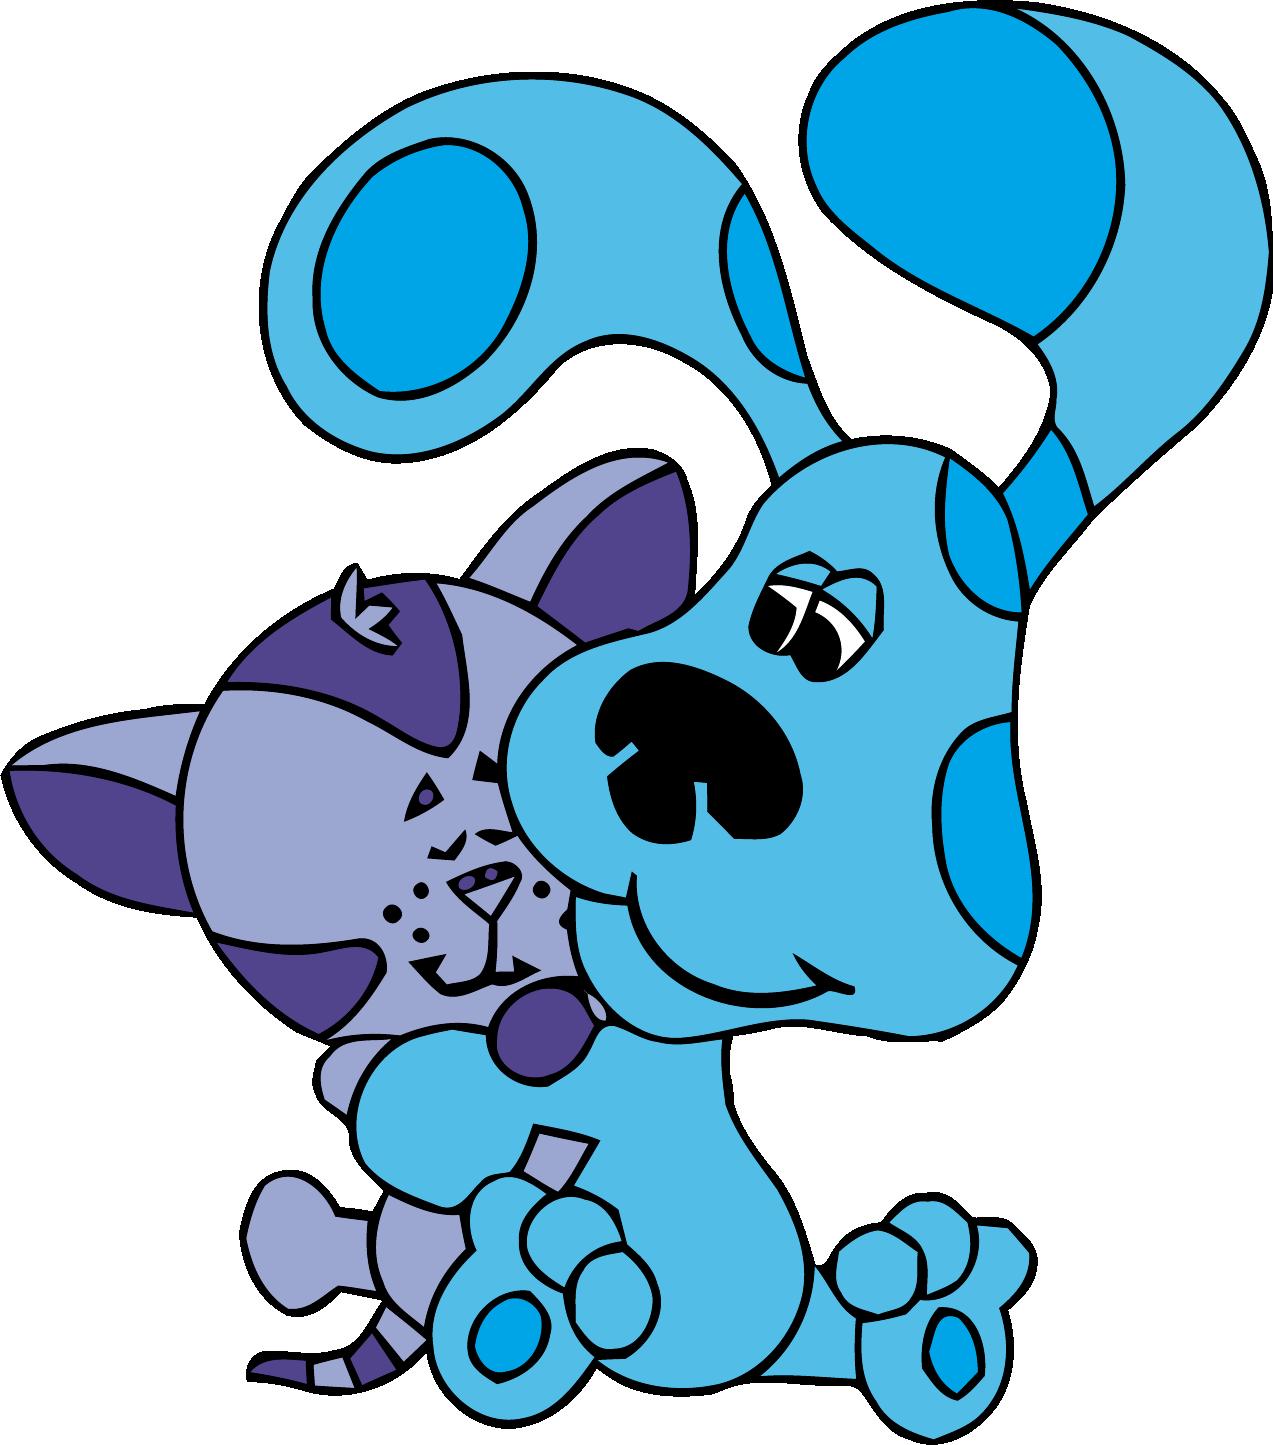 1273x1445 Blue's Clues Clip Art Love Cat Clipart Png